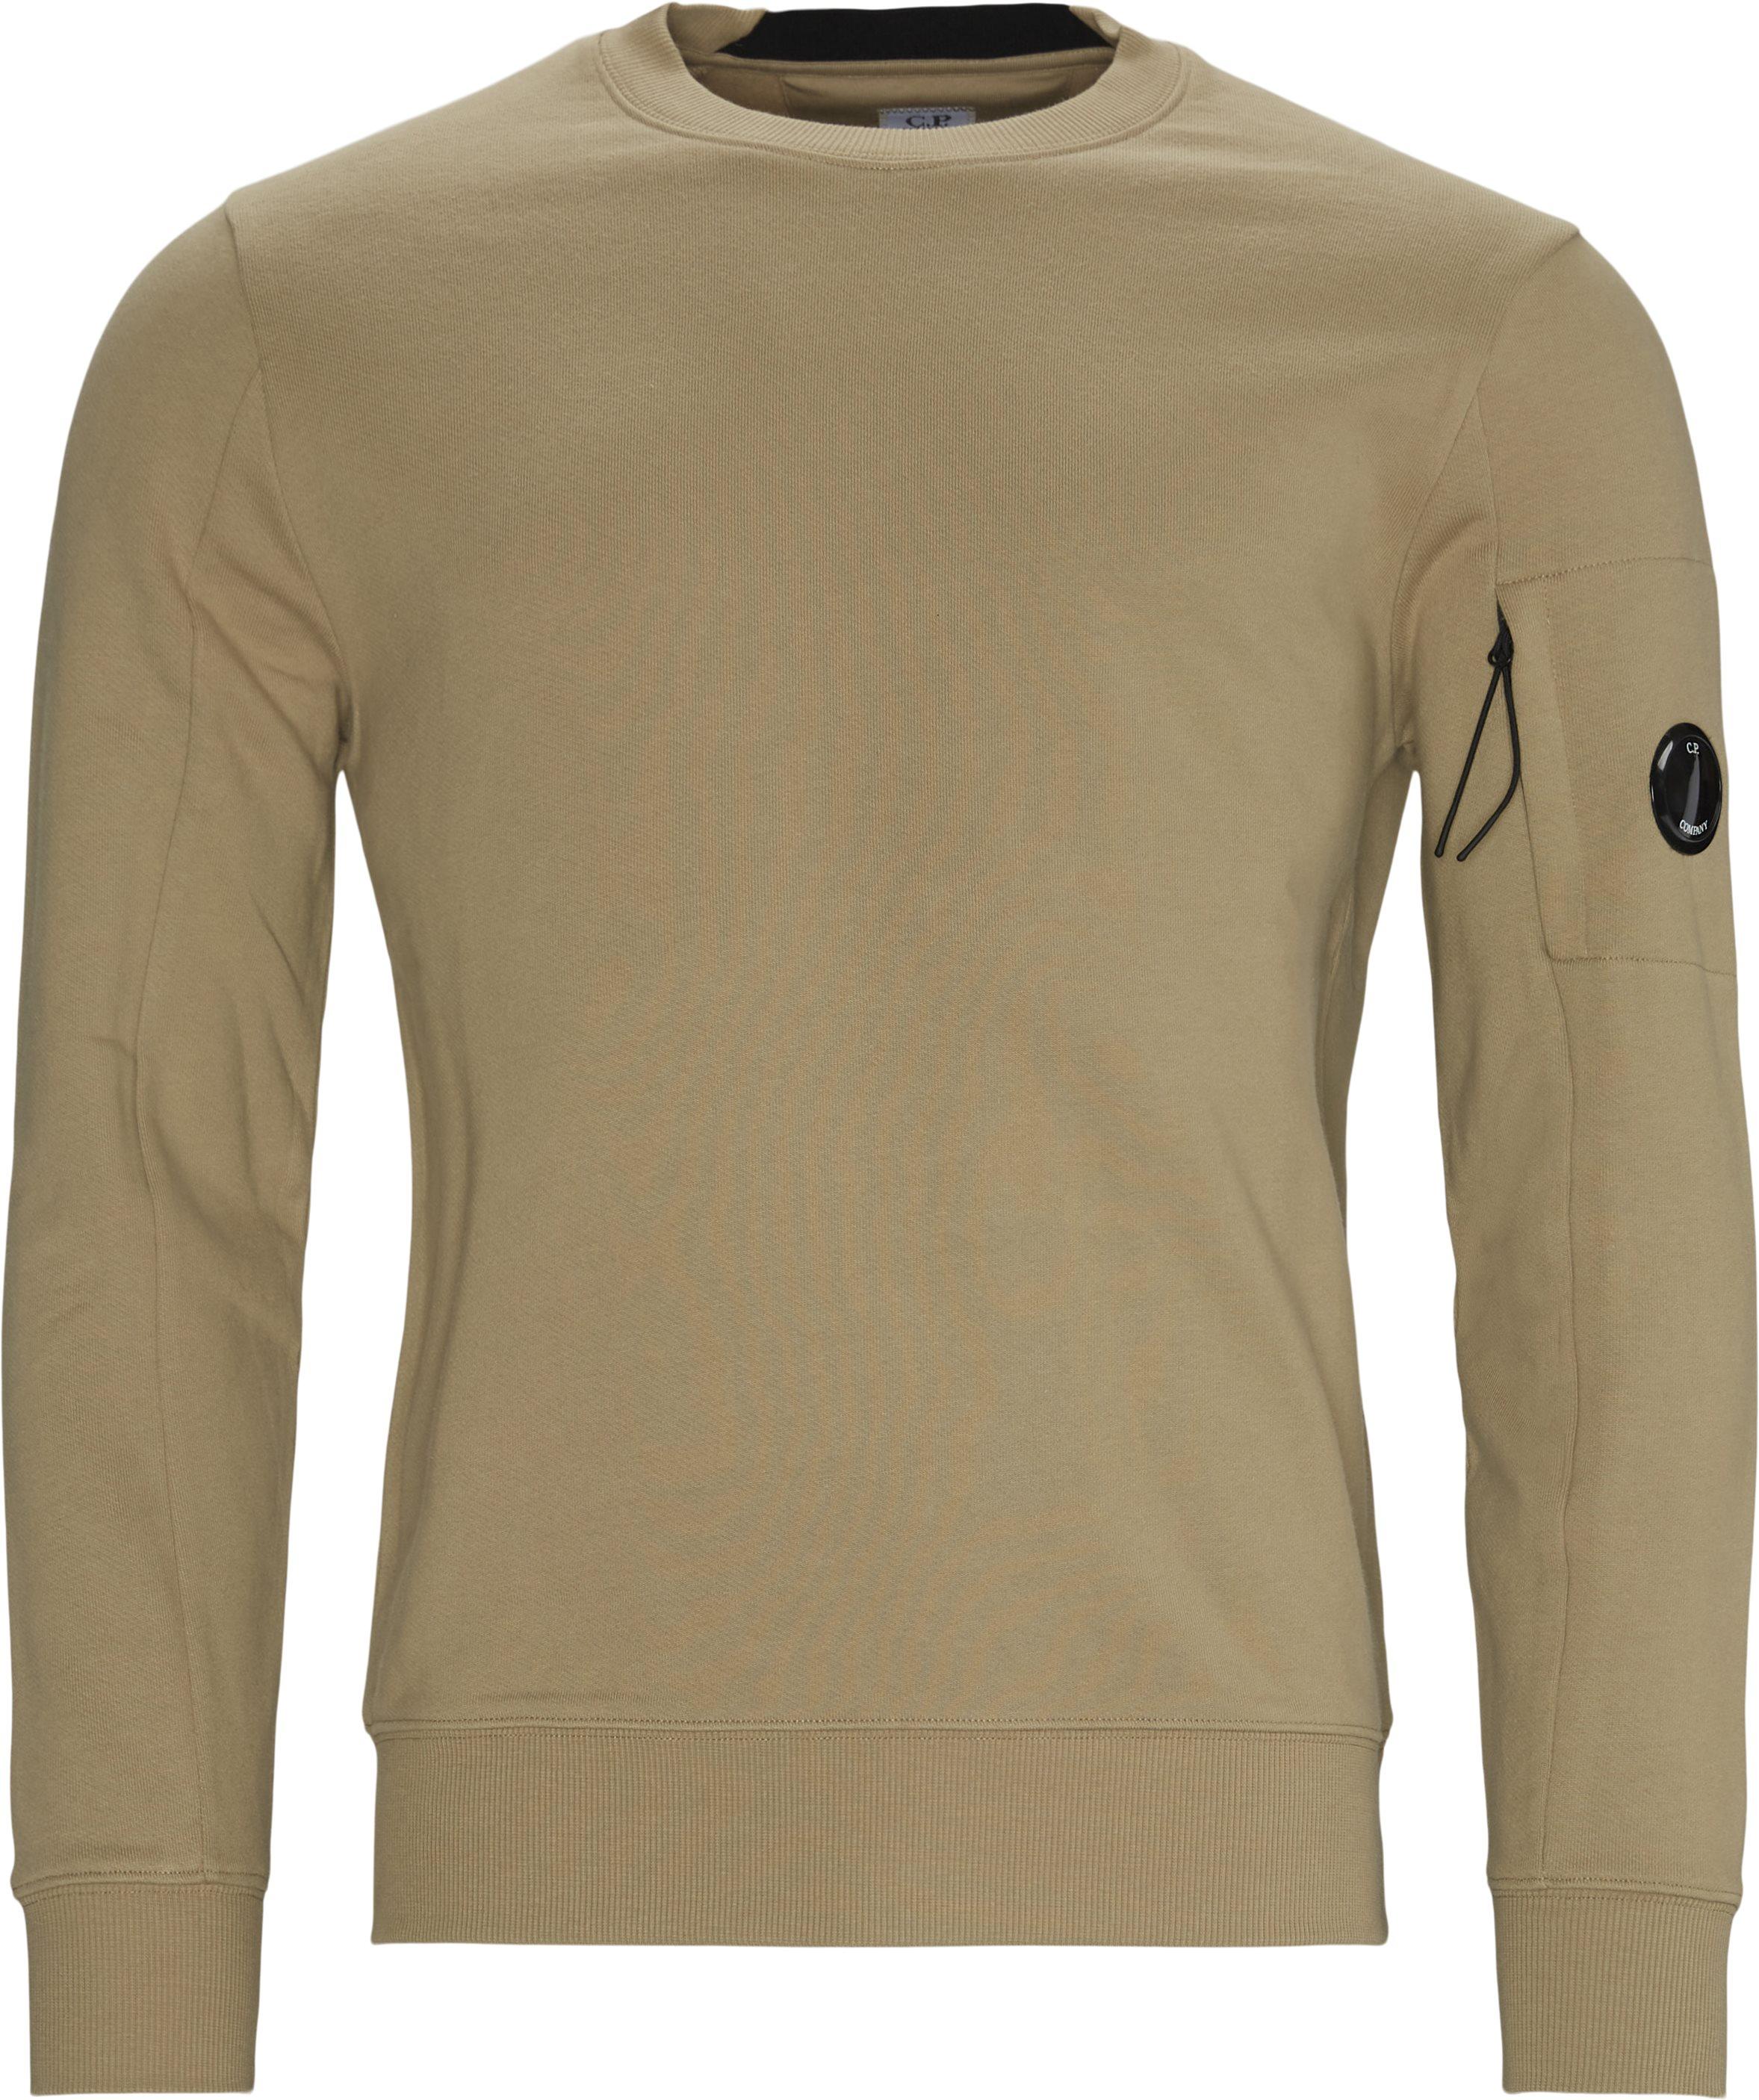 Garment Dyed Light Fleece Lens Crew Sweat - Sweatshirts - Regular fit - Sand